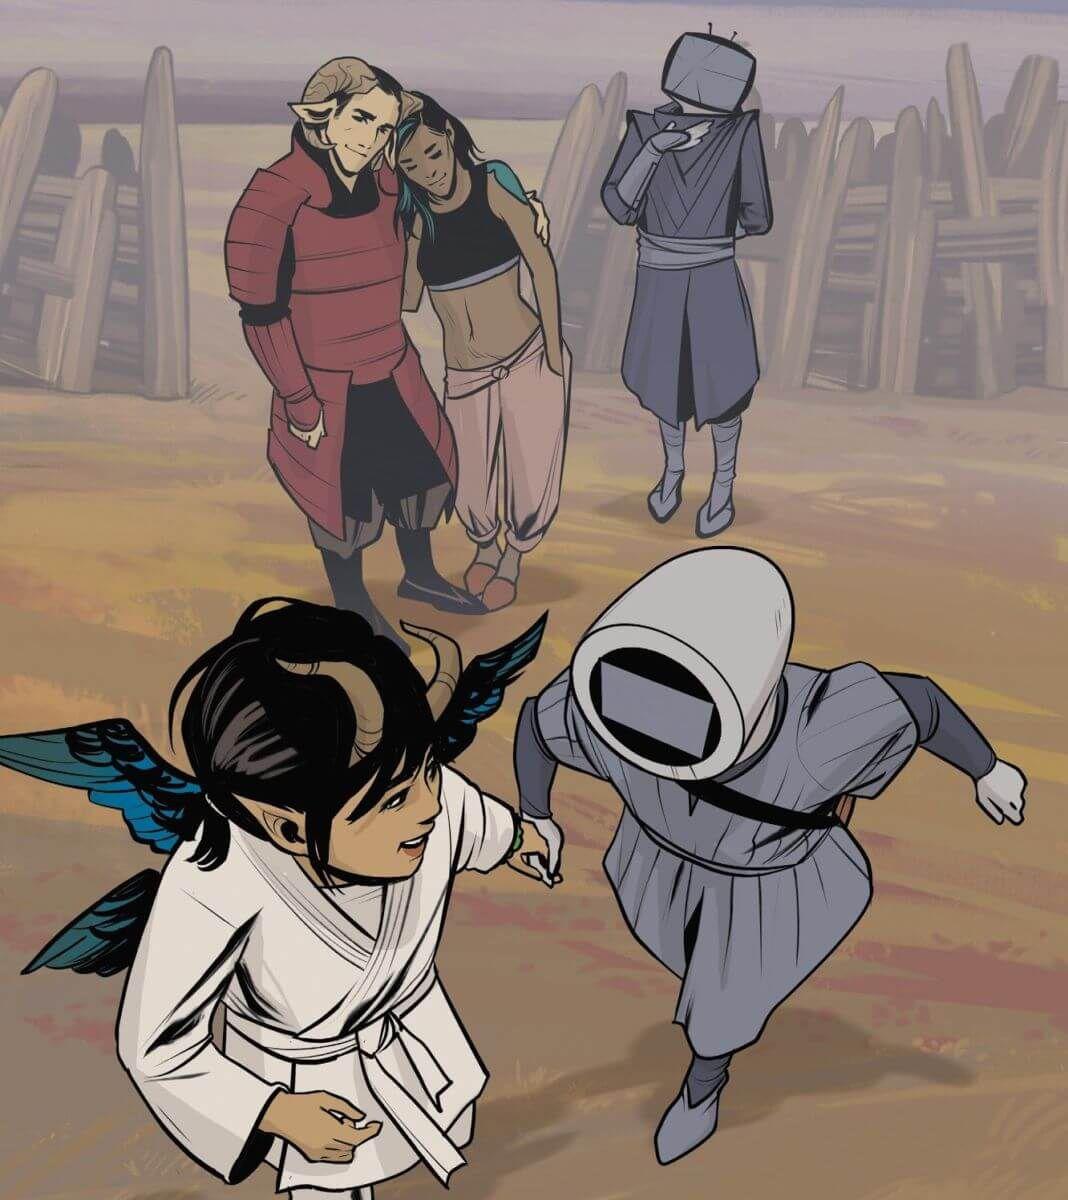 From Saga, Image Comics.